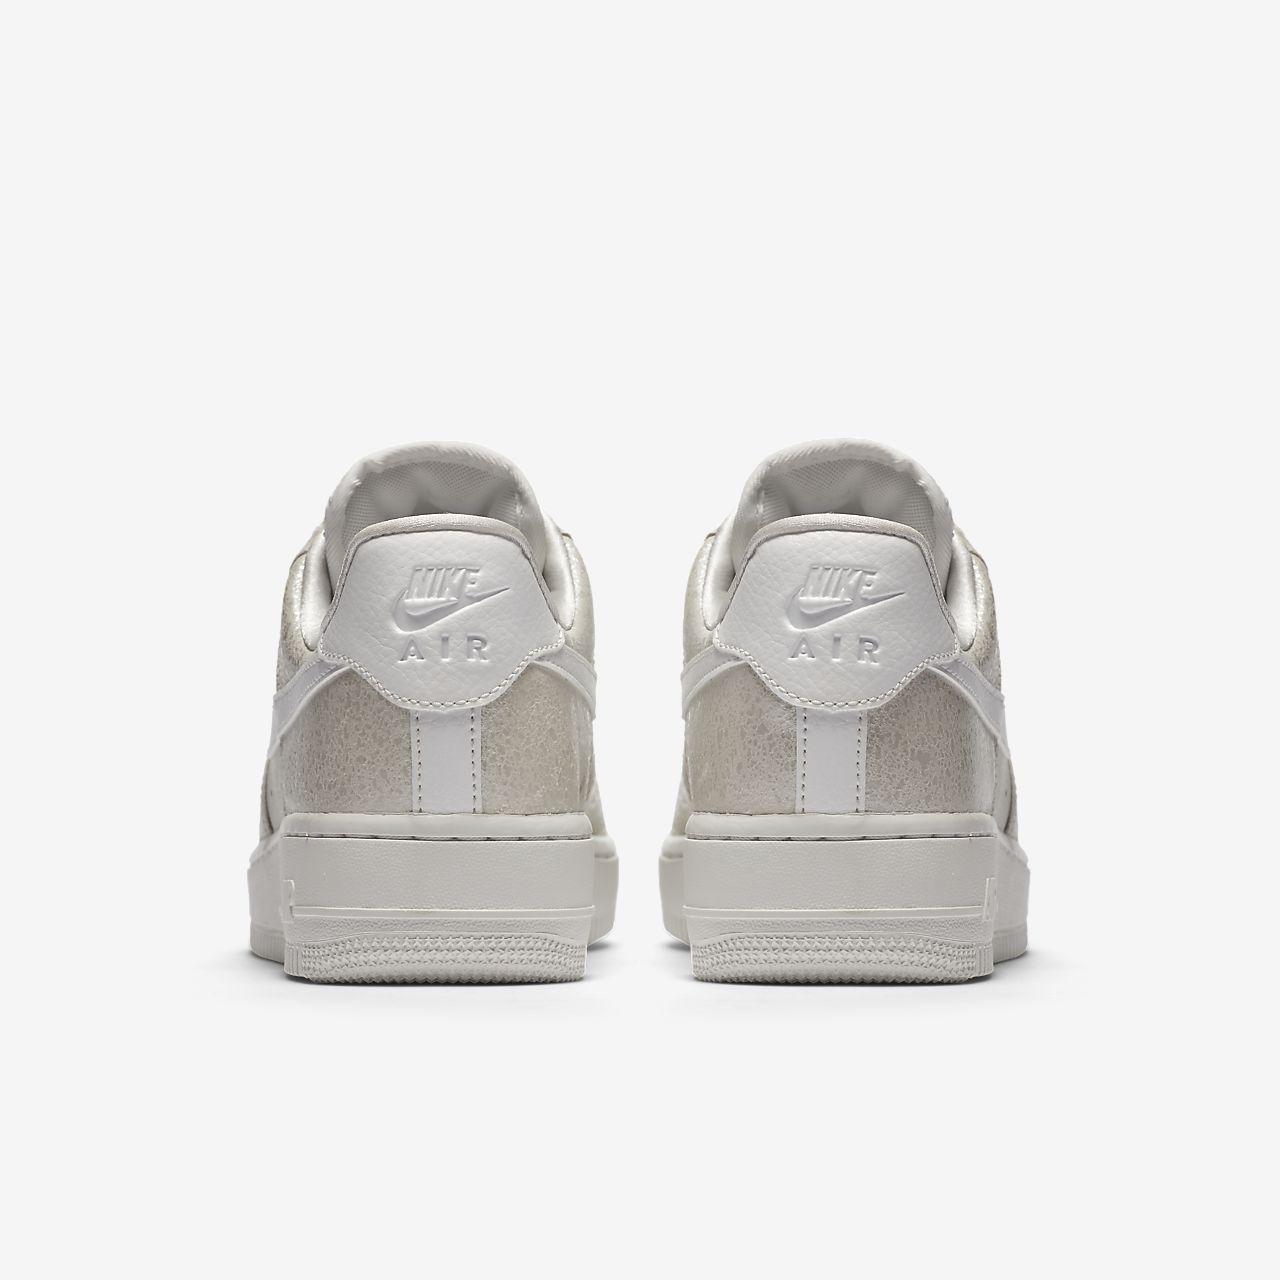 ... Nike Air Force 1 '07 Low Premium Women's Shoe